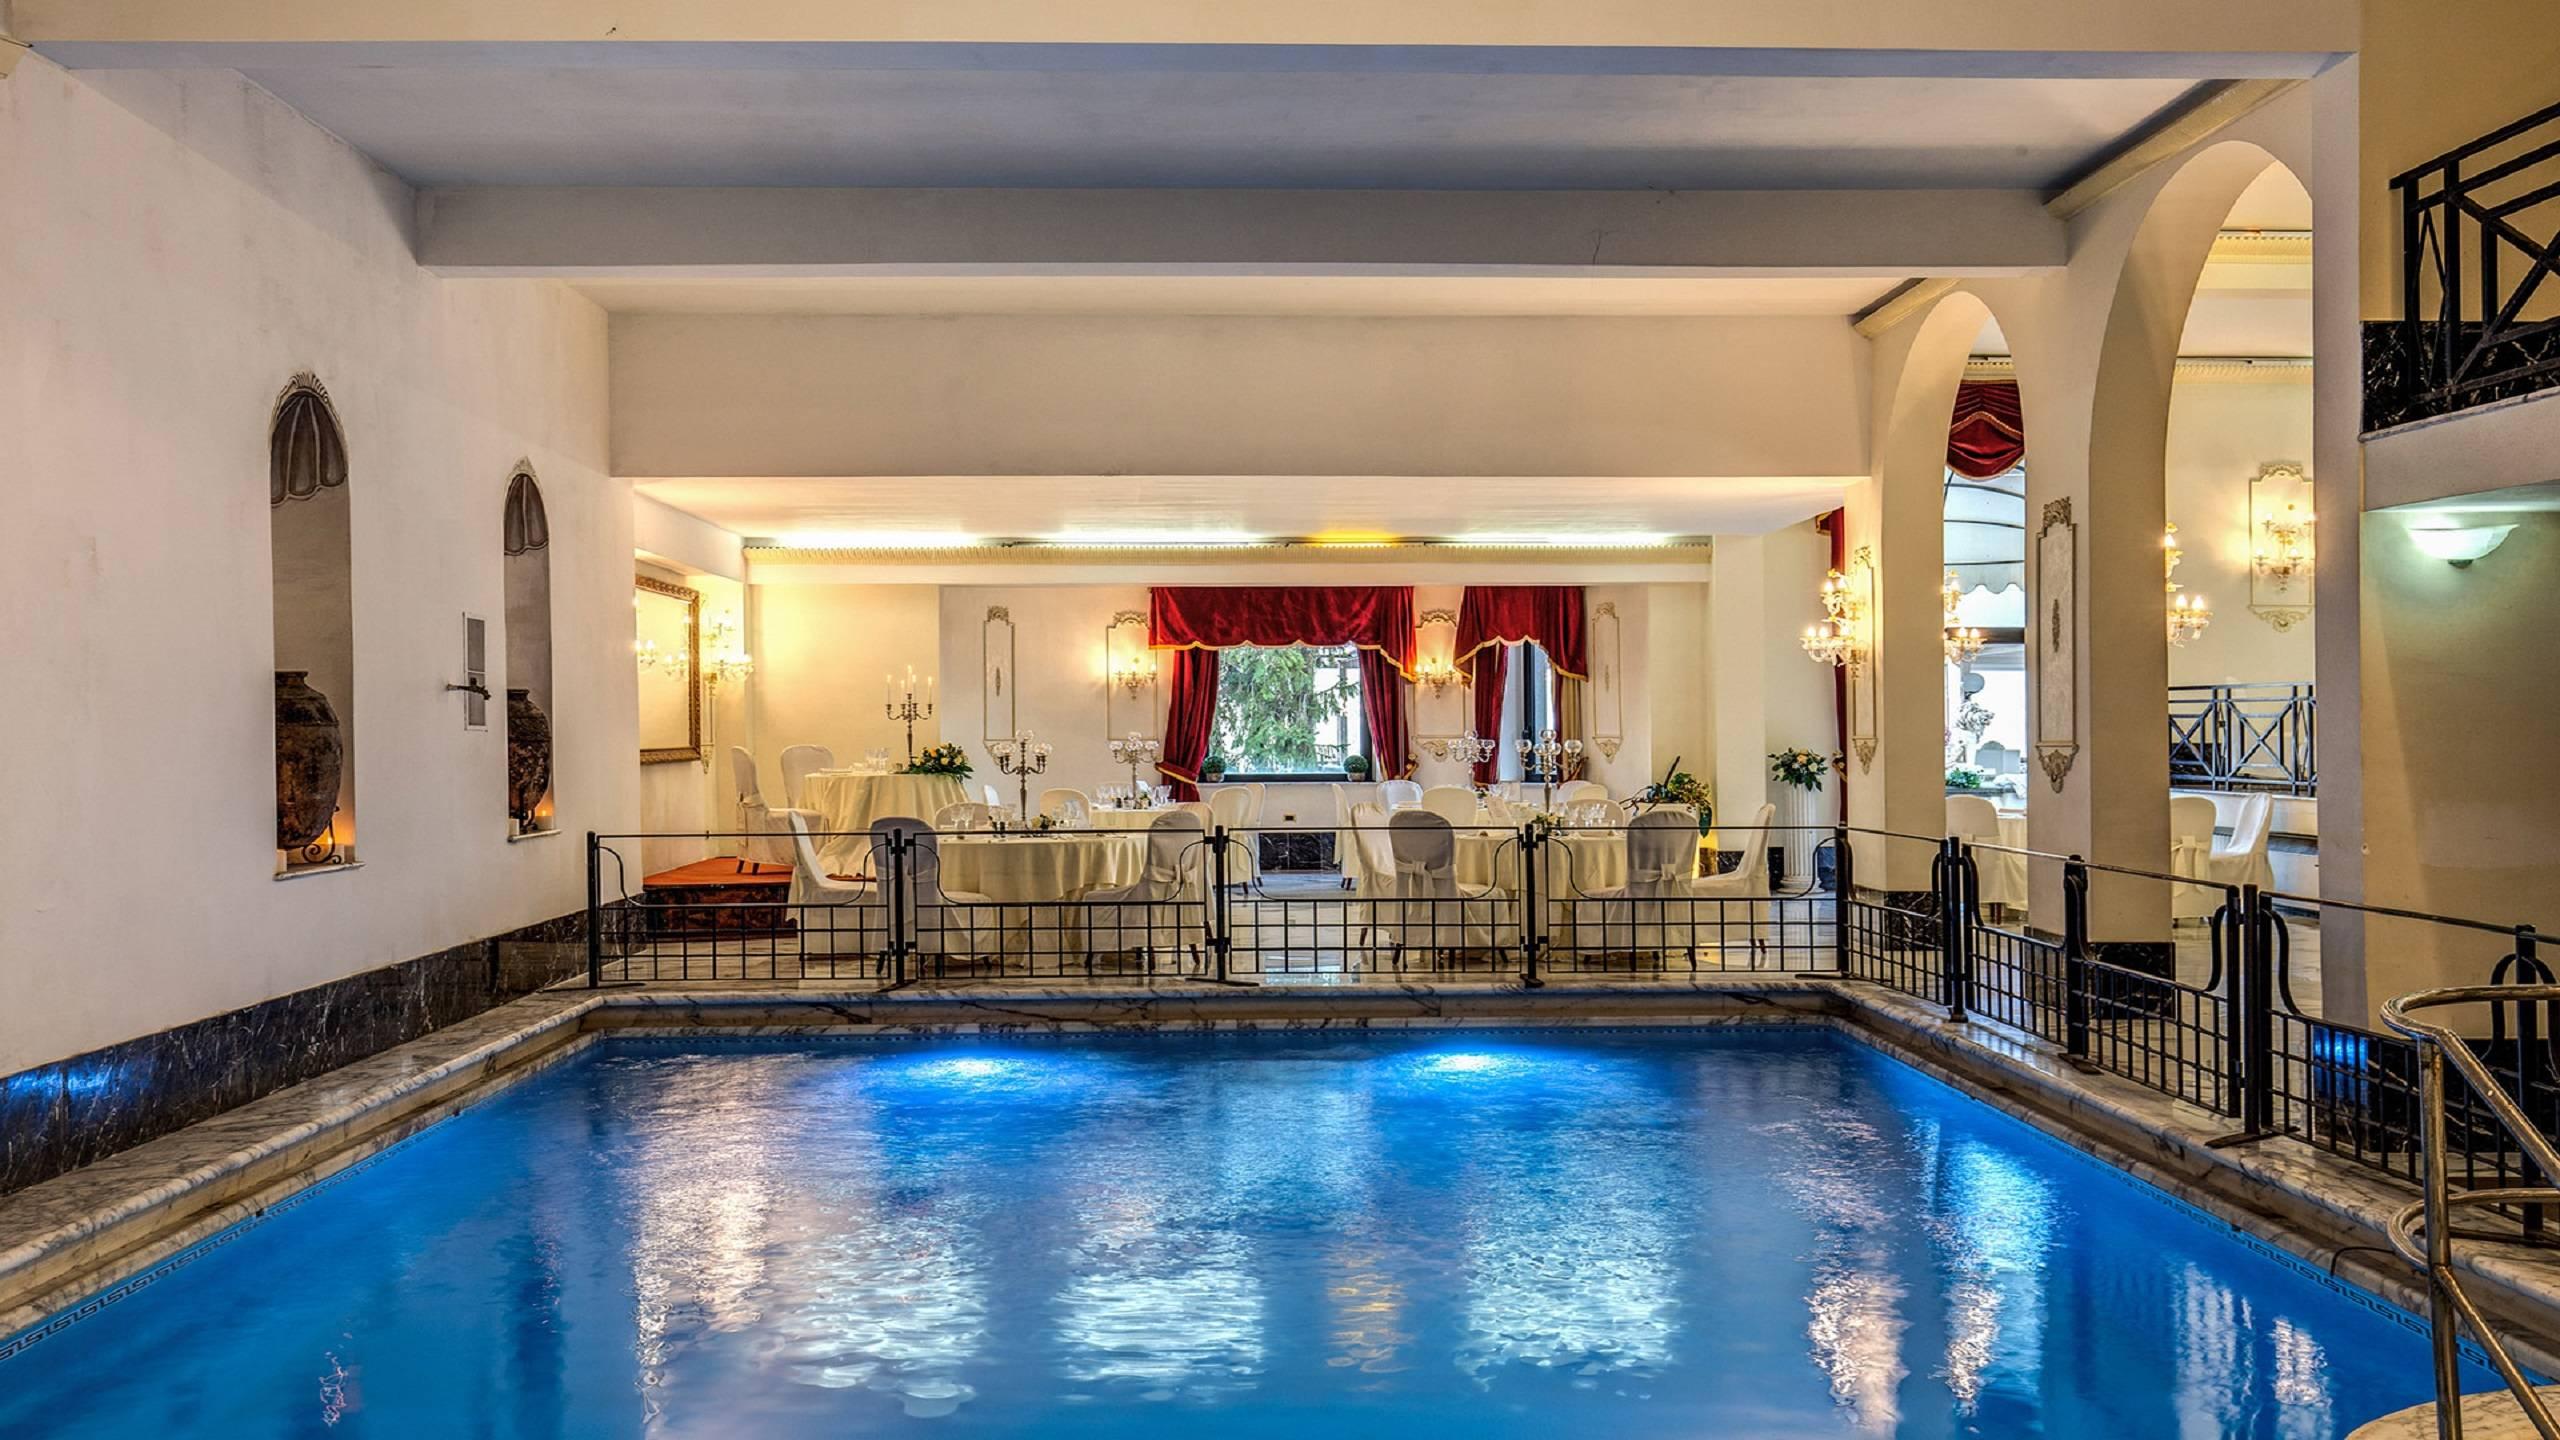 Hotel-Castel-Vecchio-Piscina-Interna-Sala-Domiziana